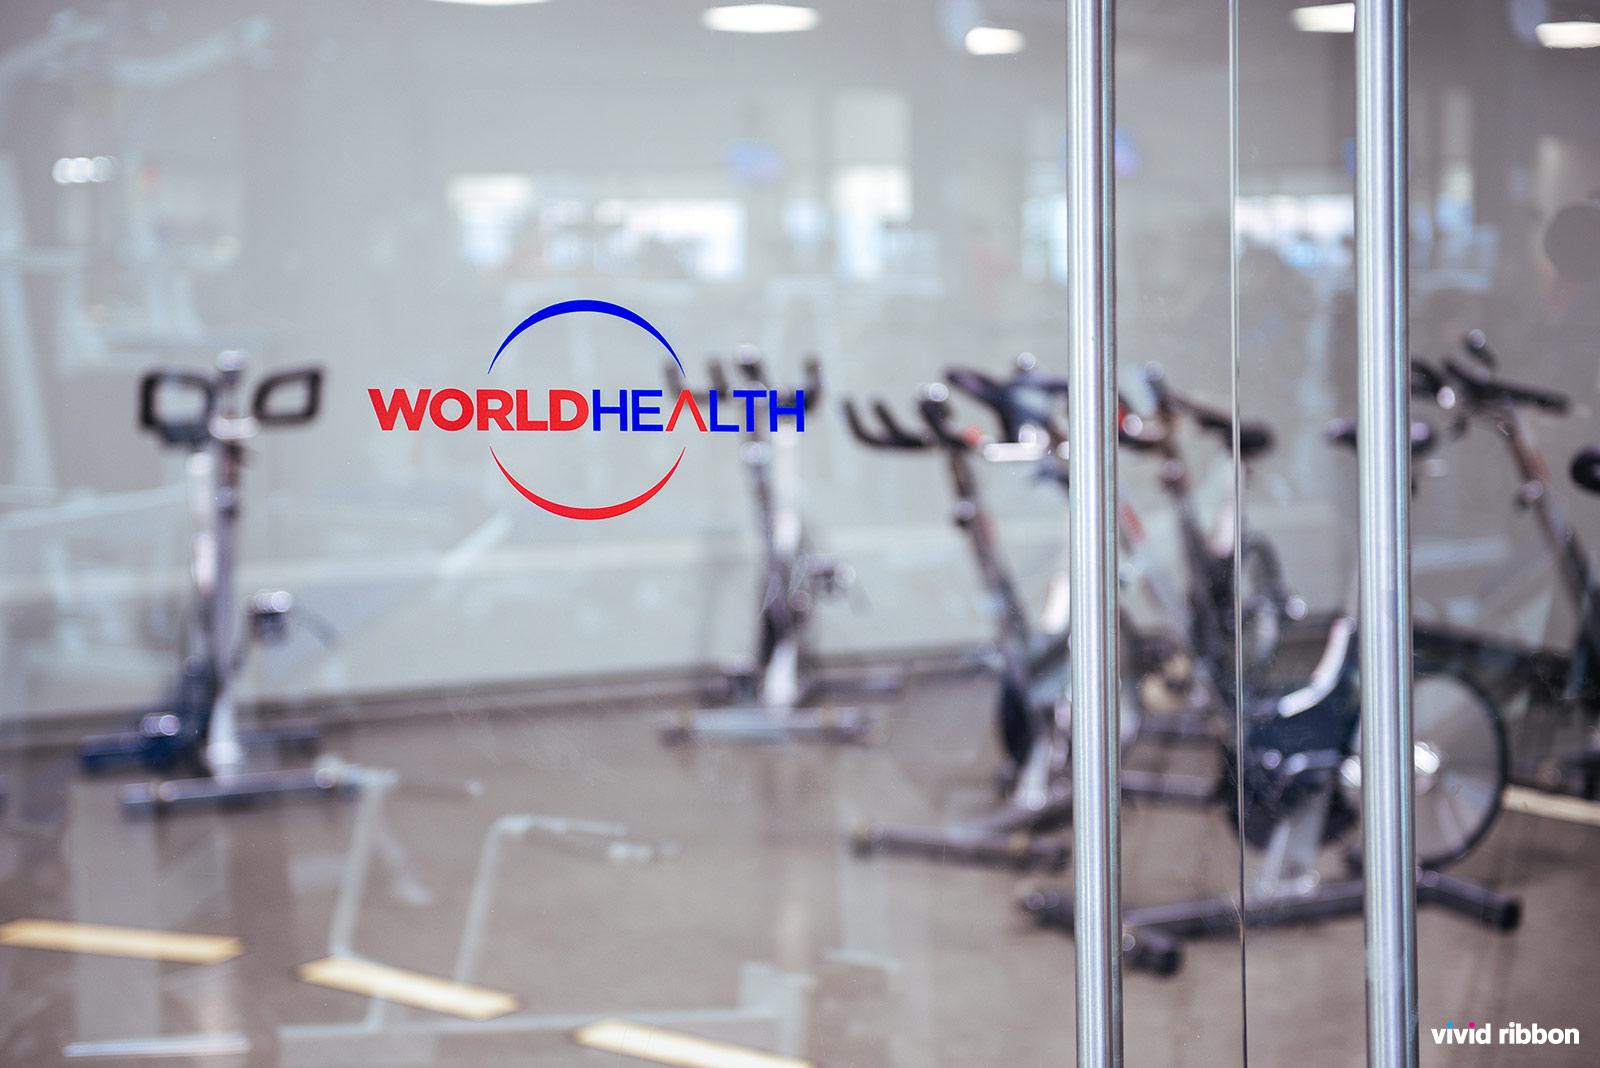 World-Health-Edmonton-WH-Whitemud-1834